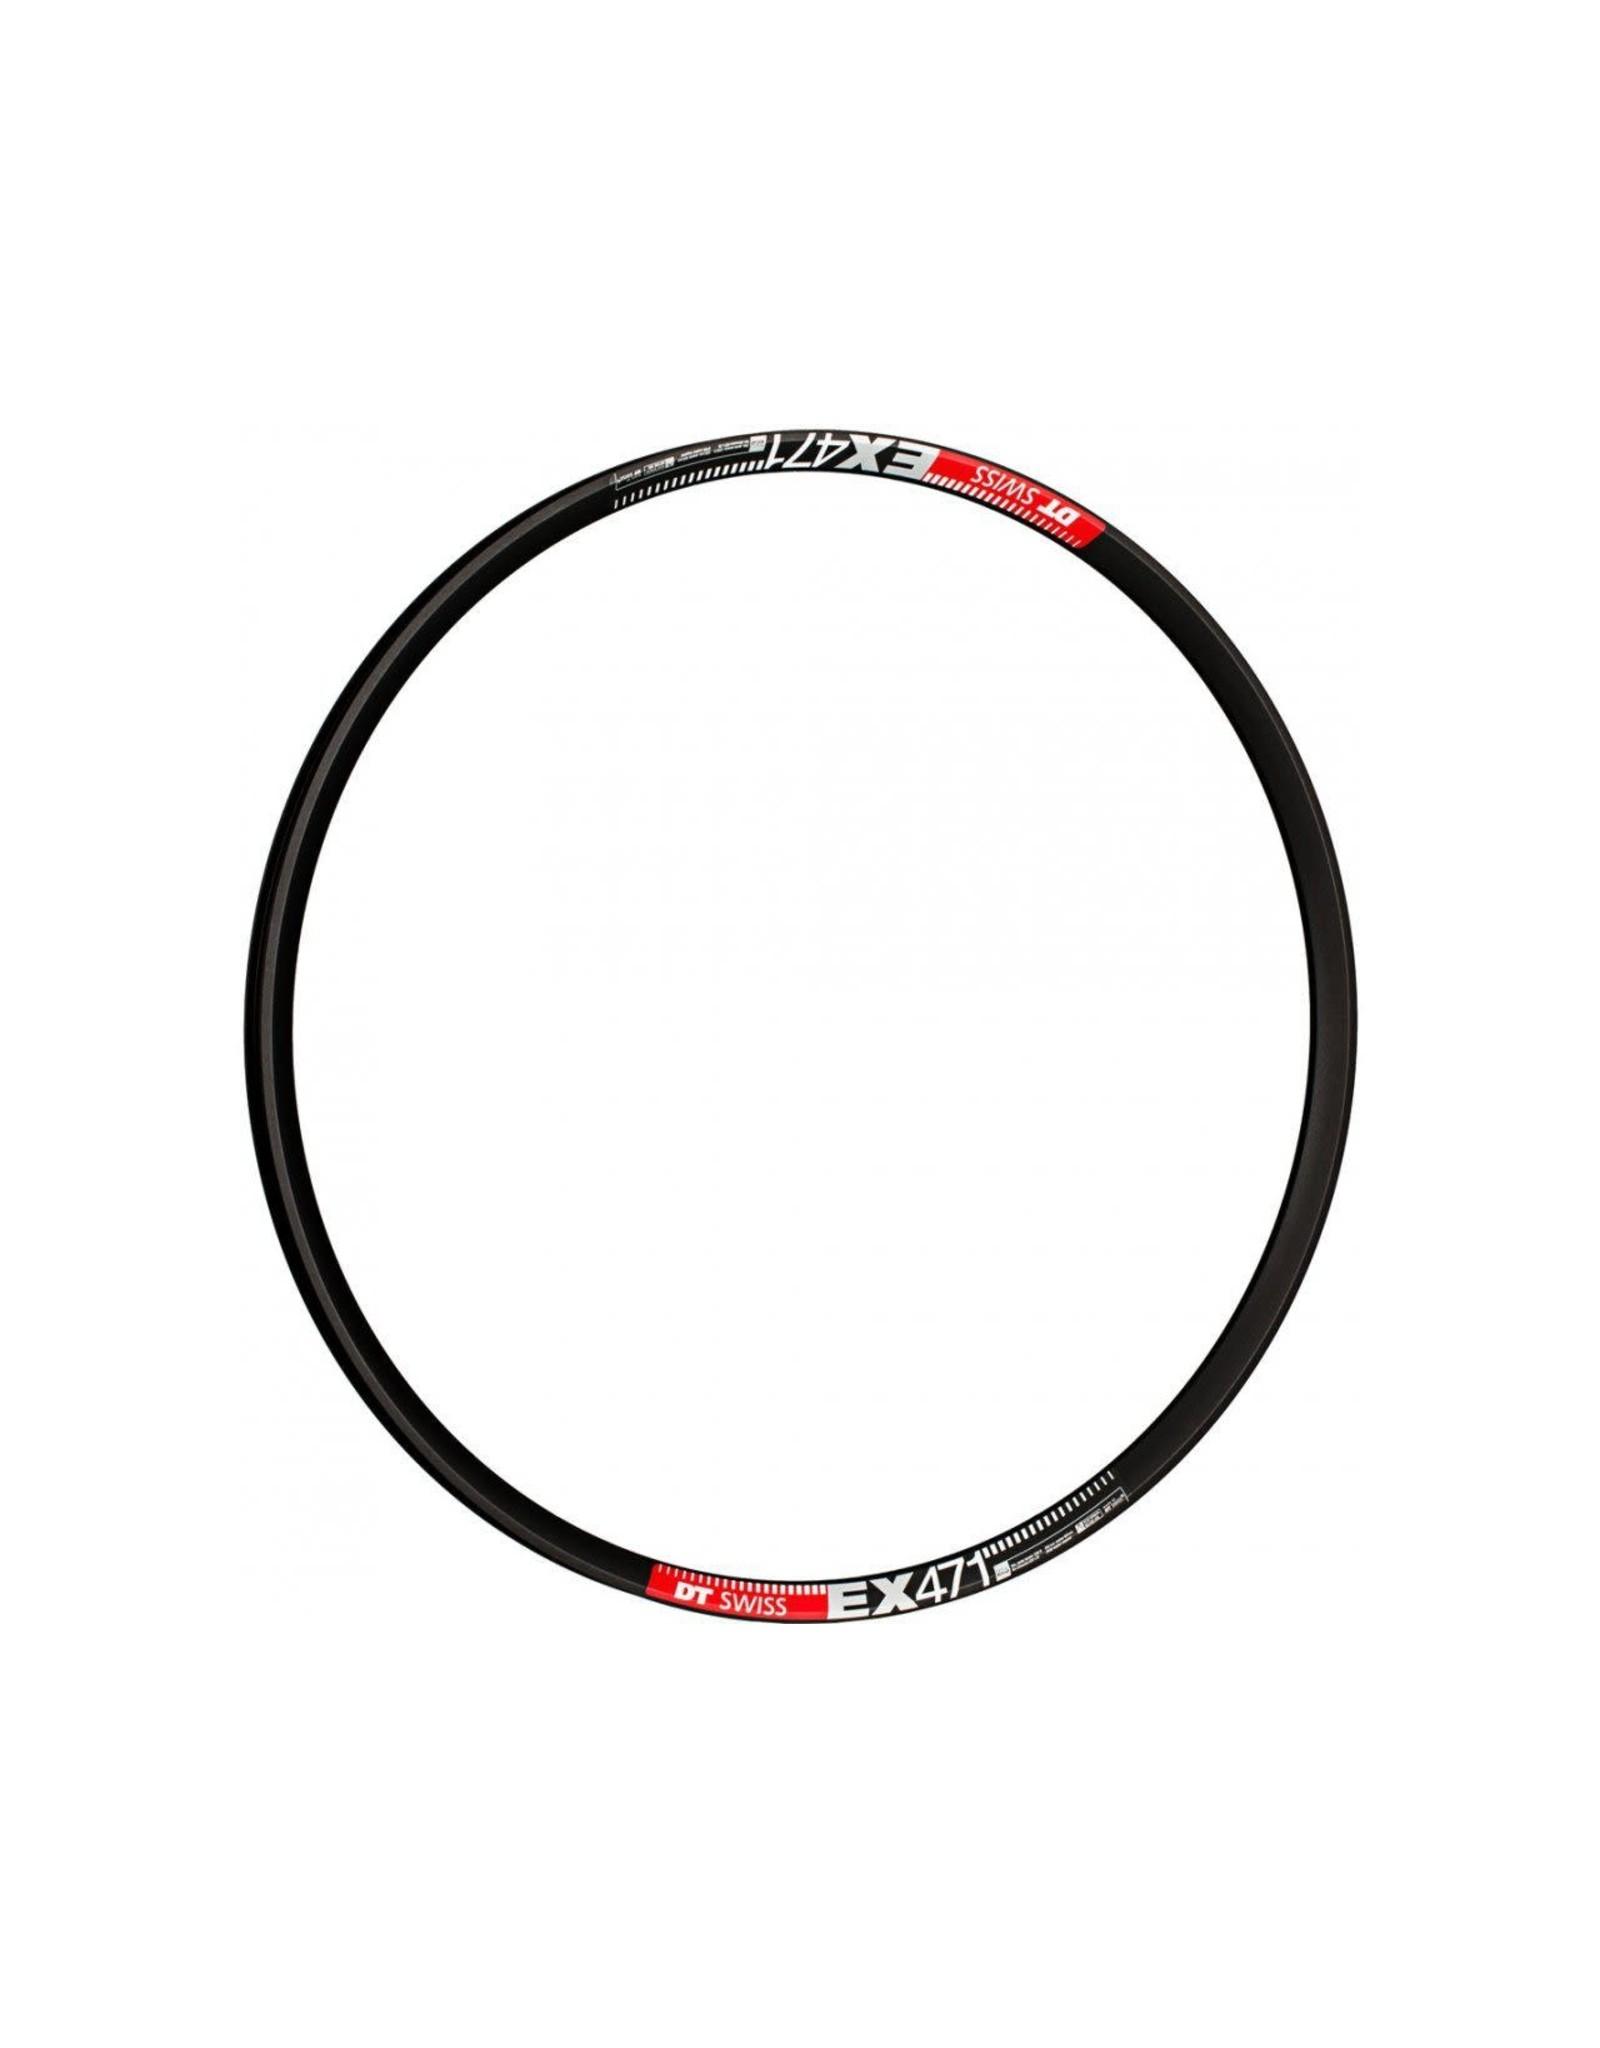 EX 471 SBWT disc-specific 32 hole Presta-drilled black - 29er